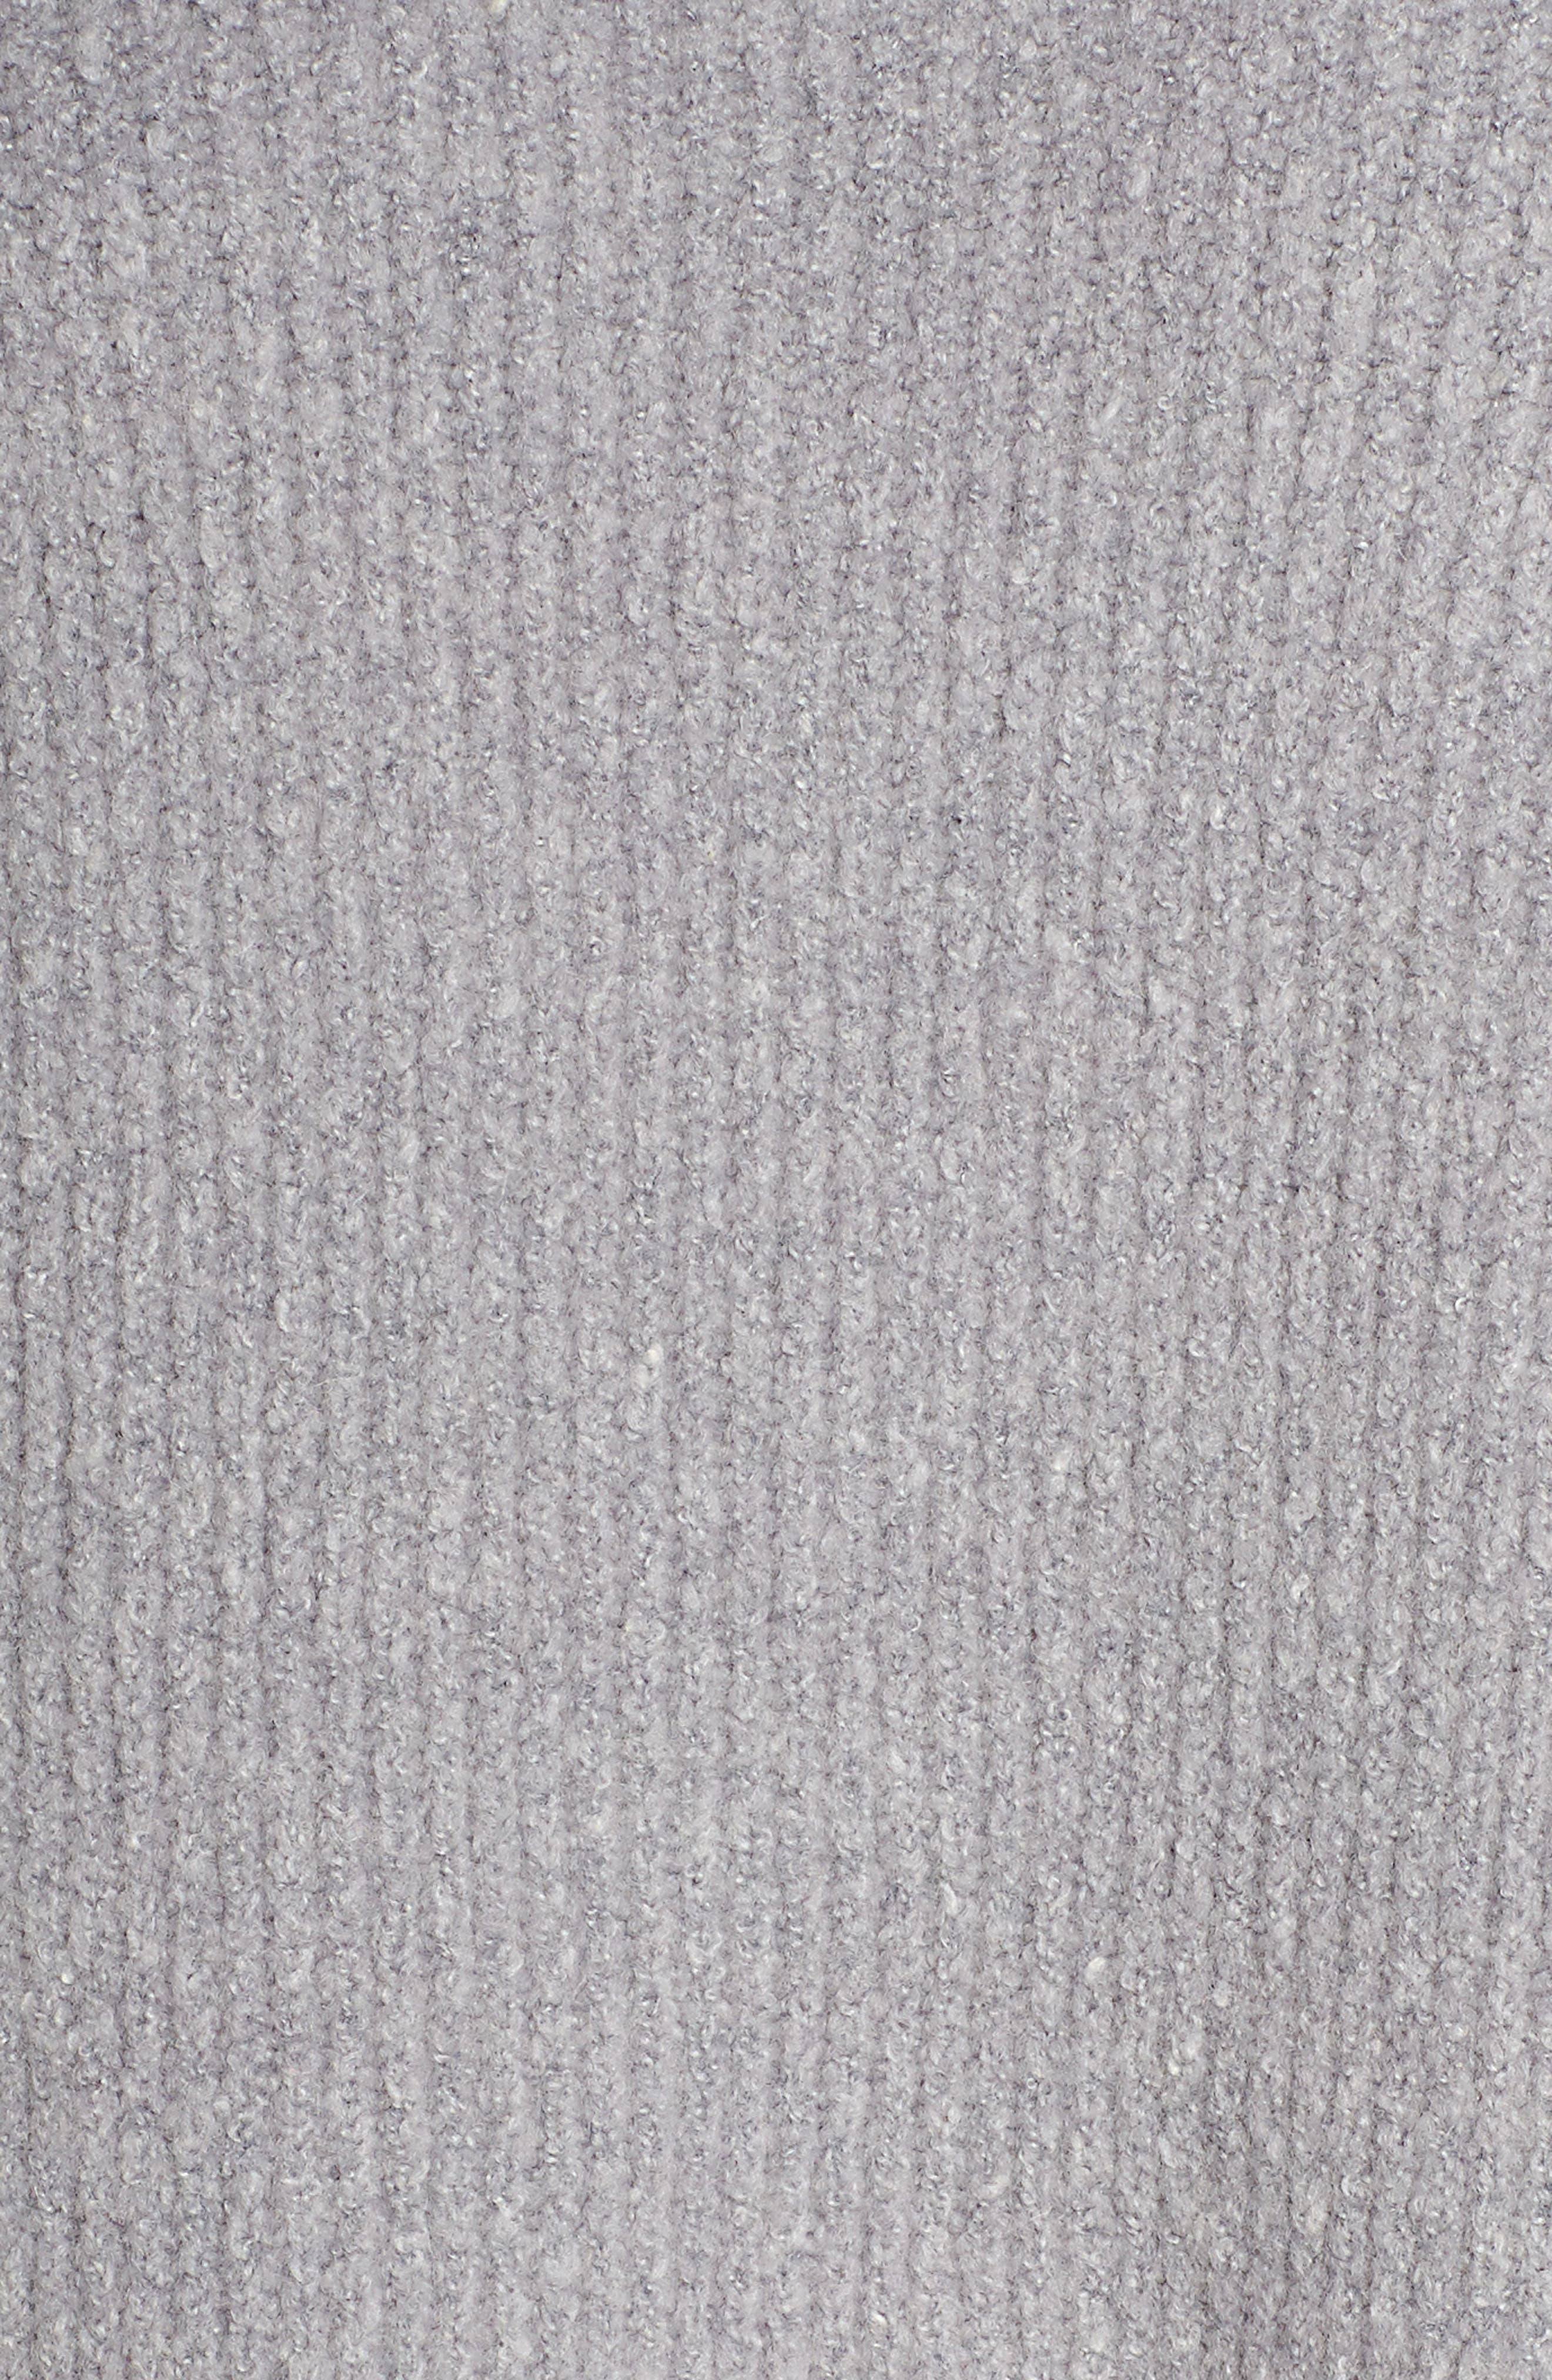 Shakti Oversize Sweater,                             Alternate thumbnail 6, color,                             SILVER GREY MARL